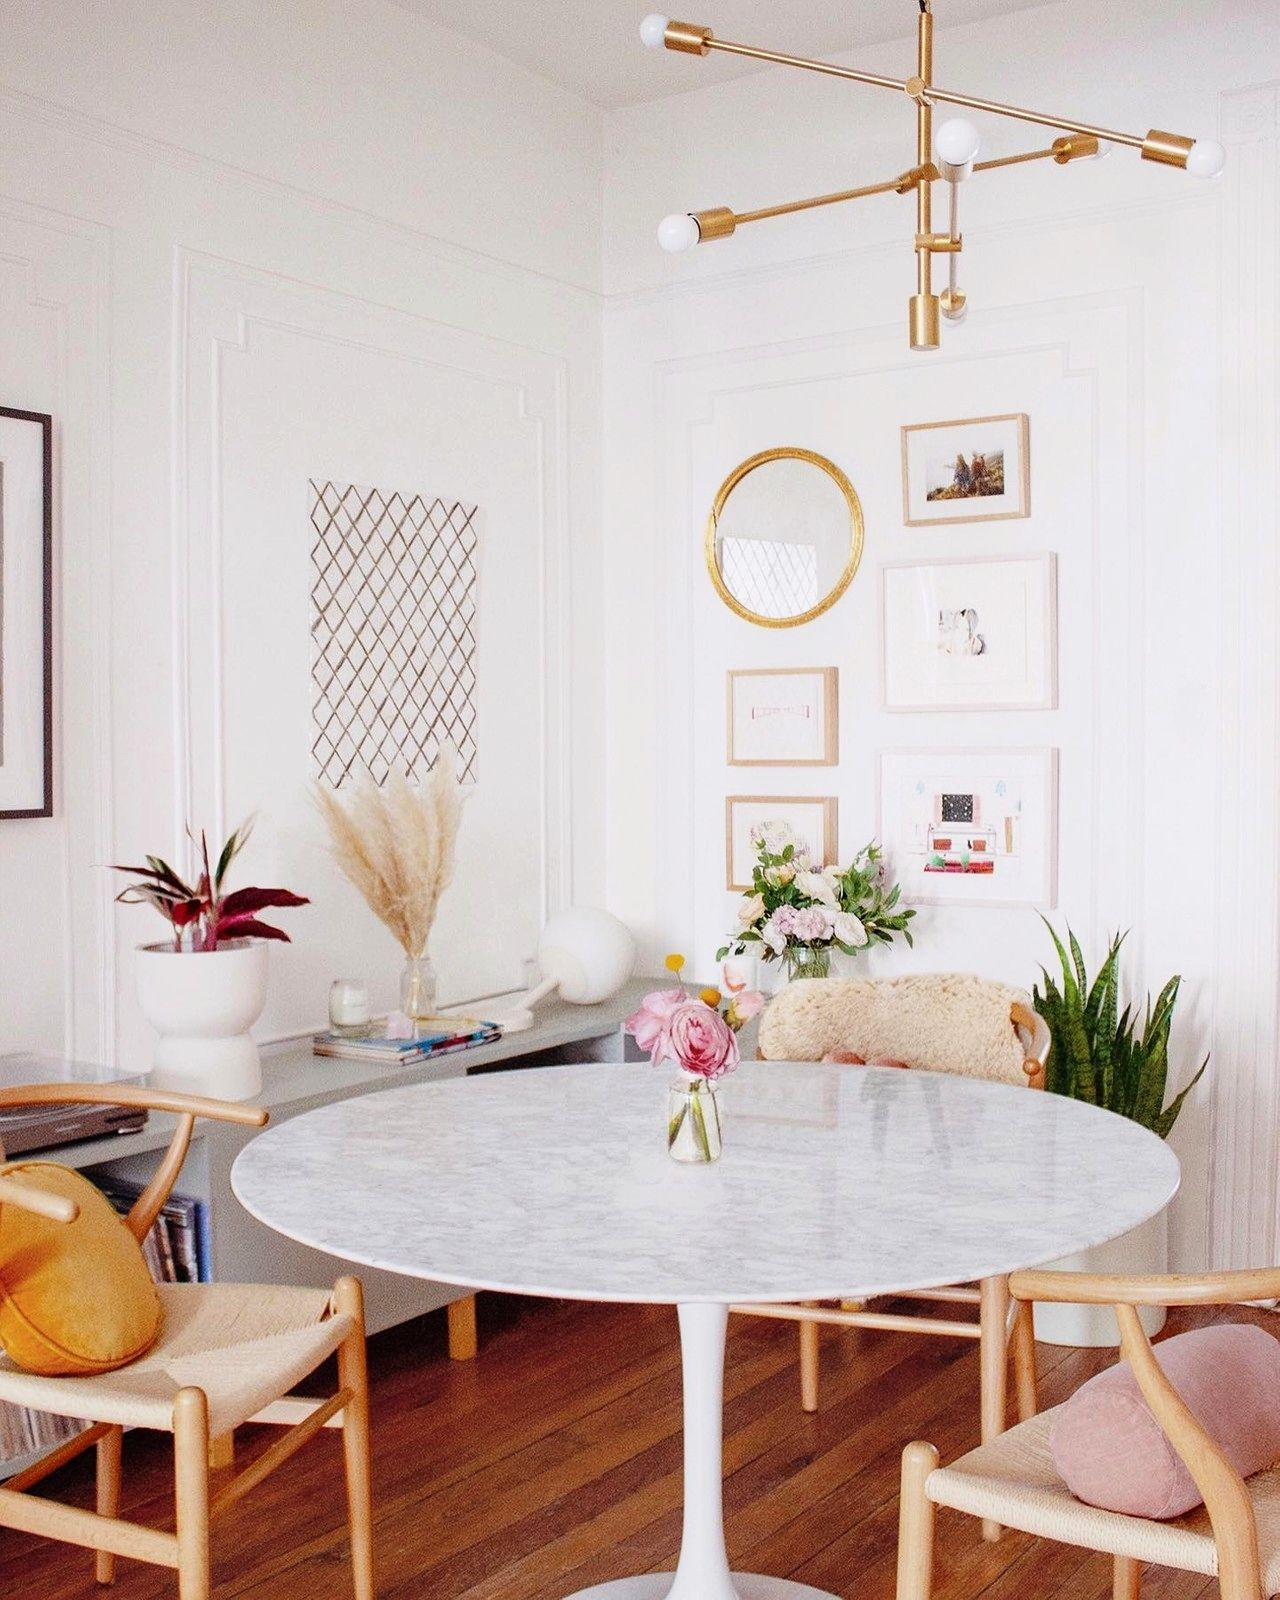 Saarinen Tulip Round Marble Dining Table Round Marble Dining Table Dining Table Marble Apartment Dining